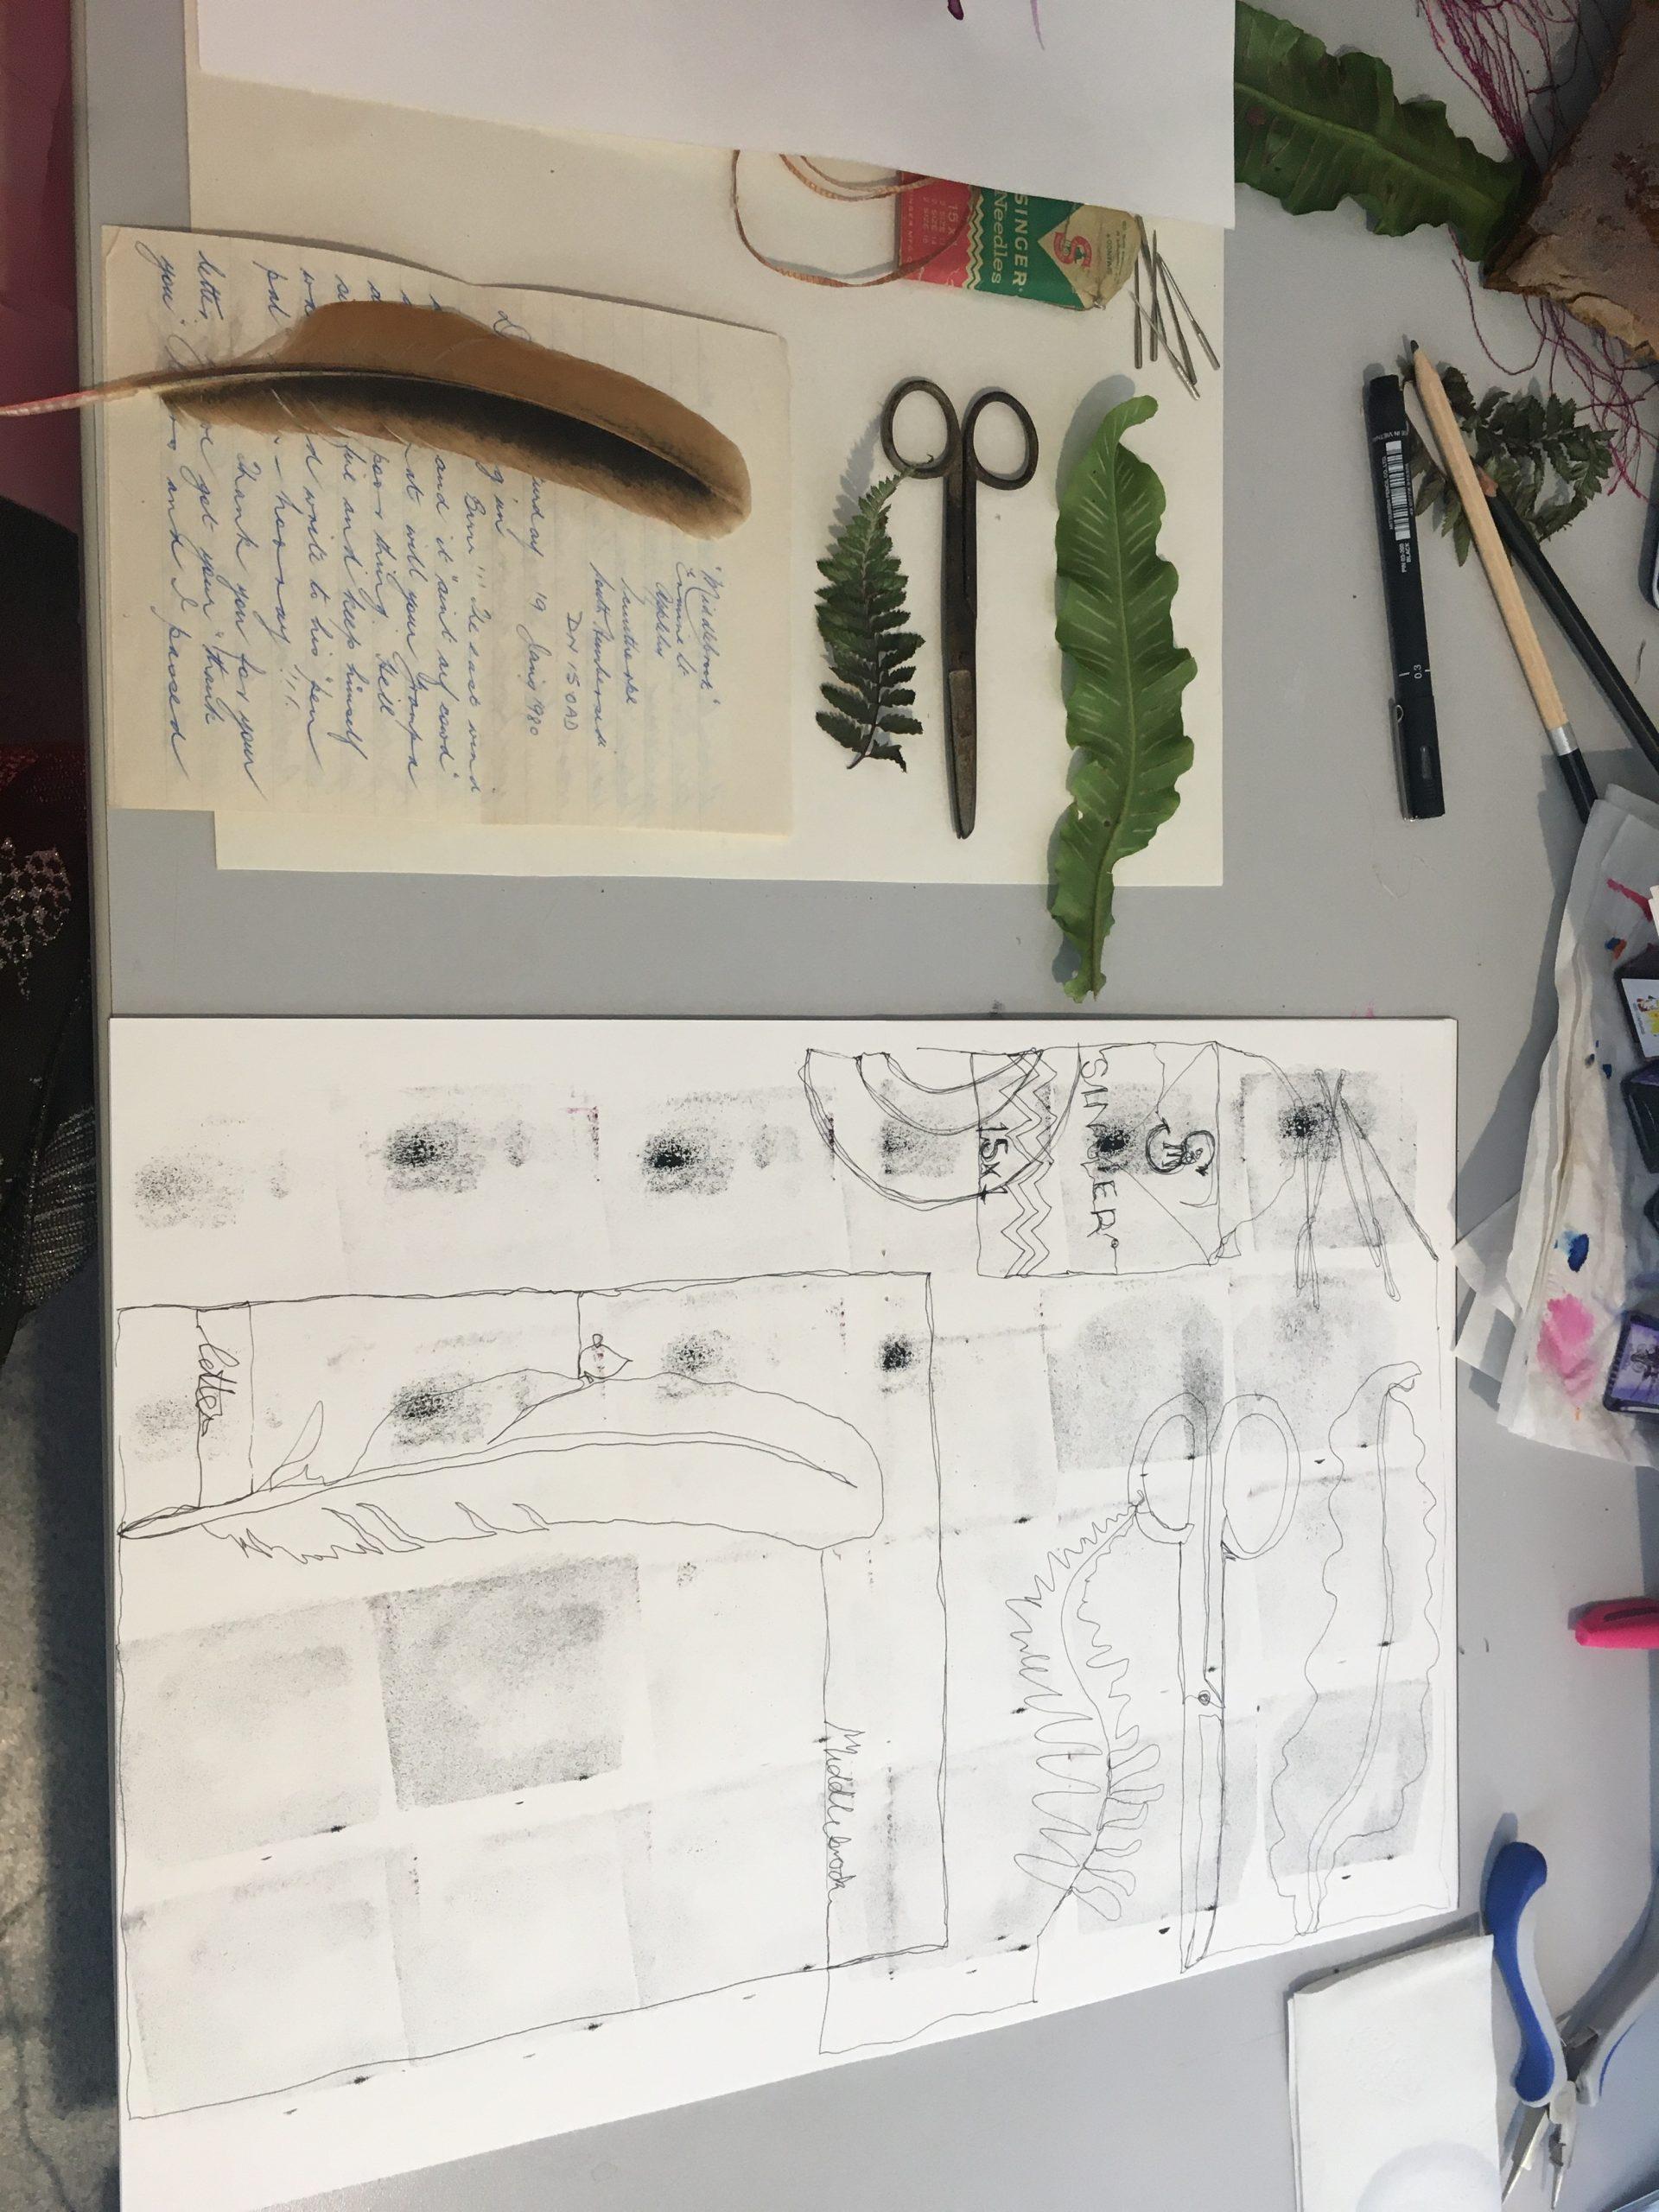 A photograph of a textile design sketchbook page